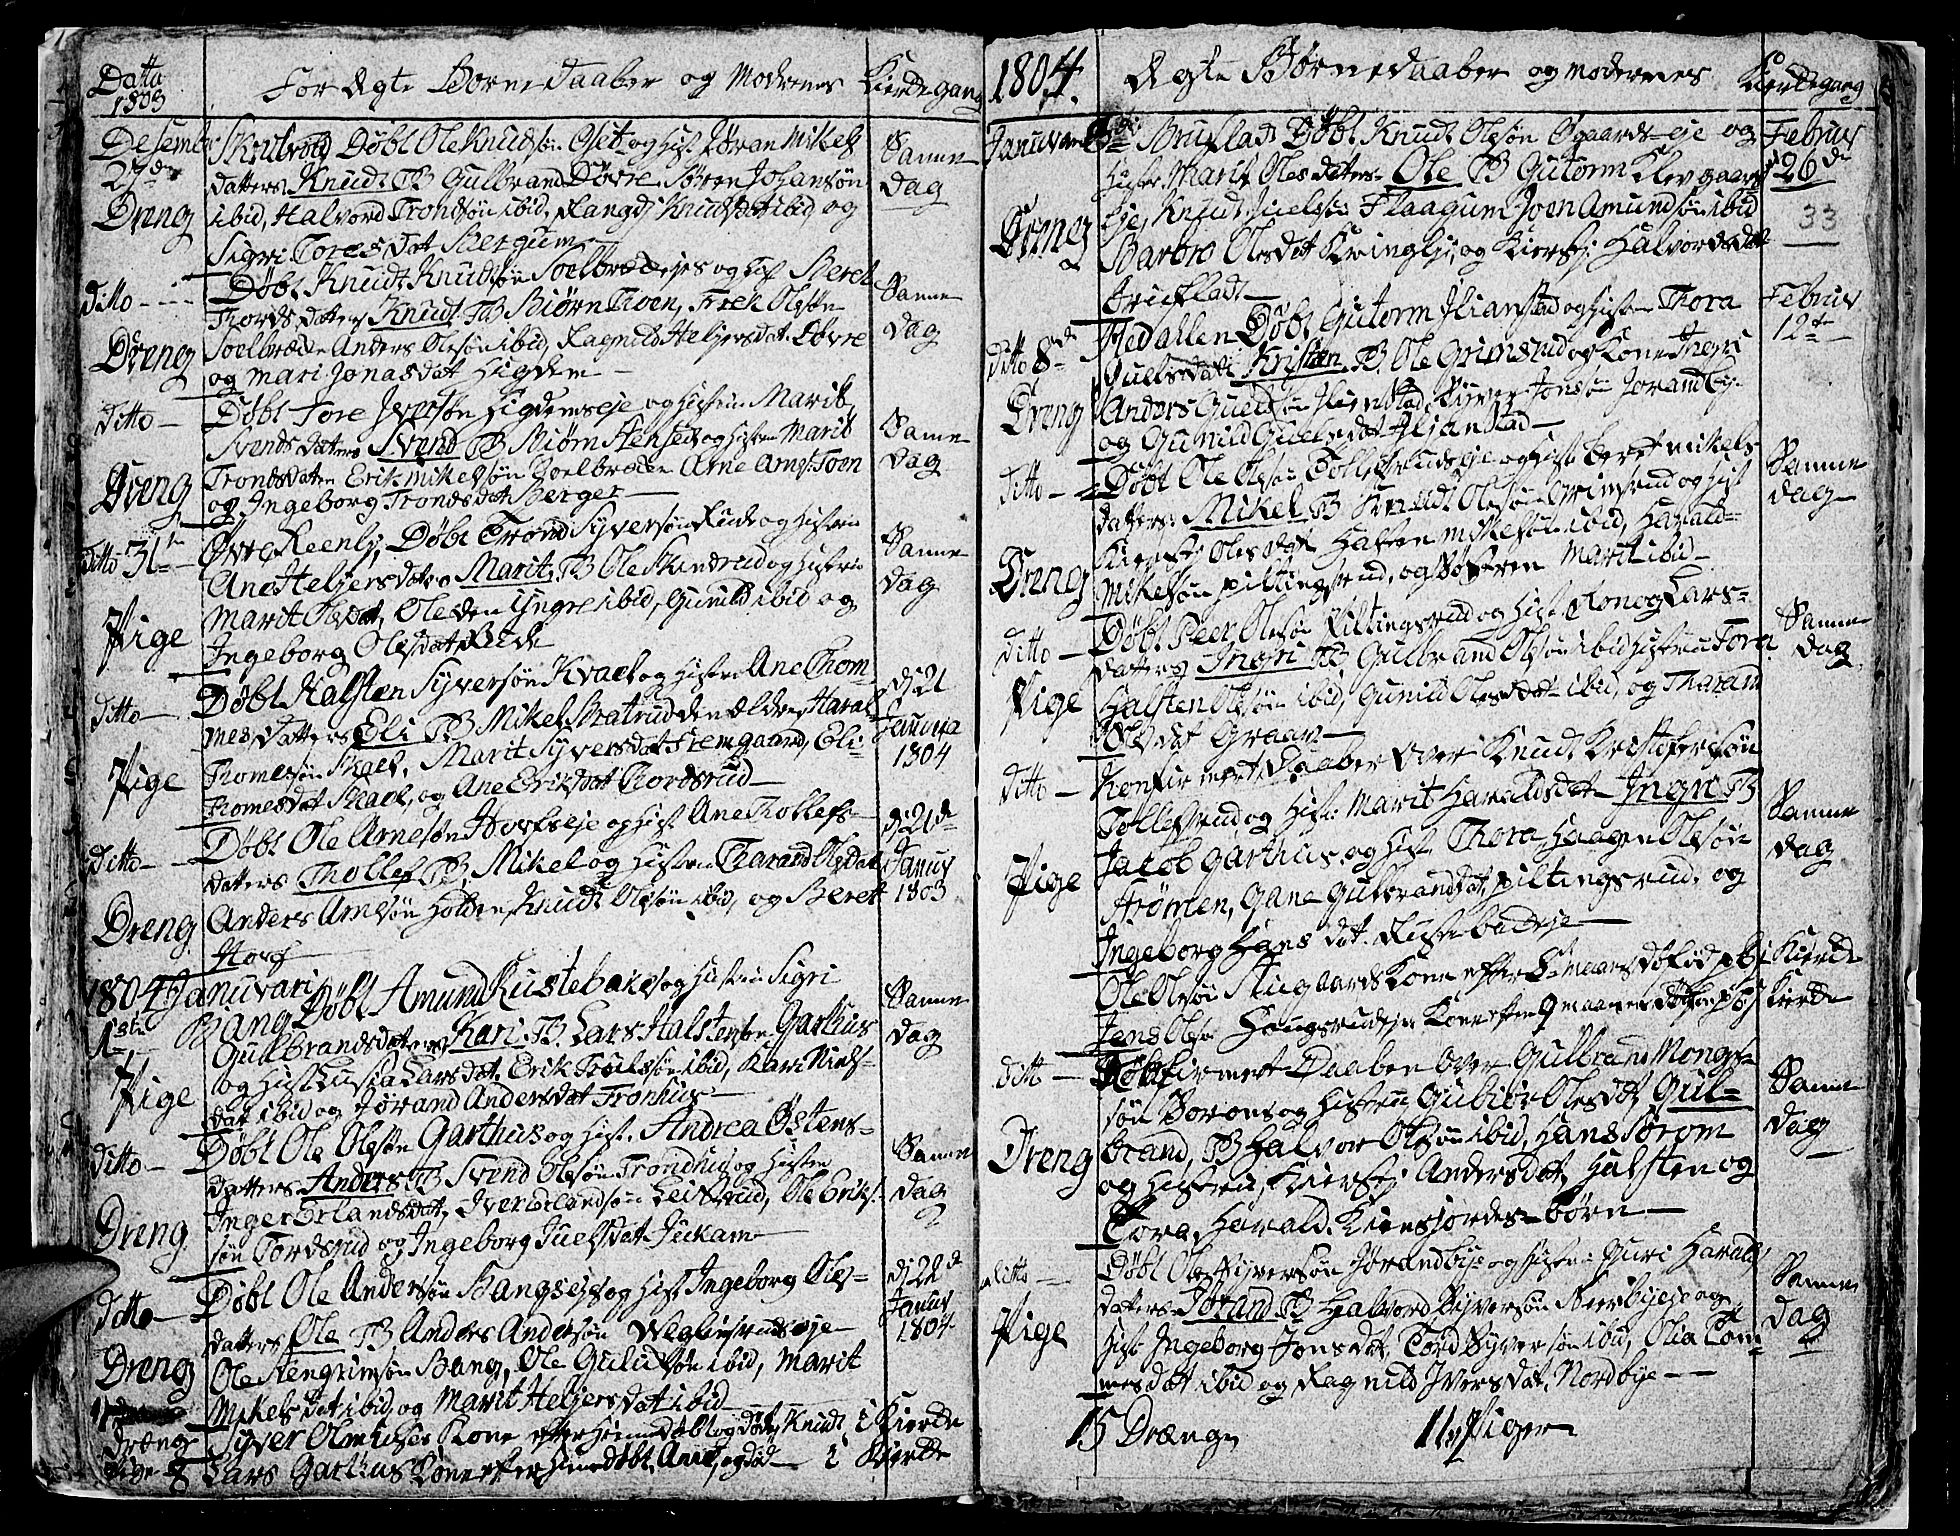 SAH, Aurdal prestekontor, Ministerialbok nr. 7, 1800-1808, s. 33